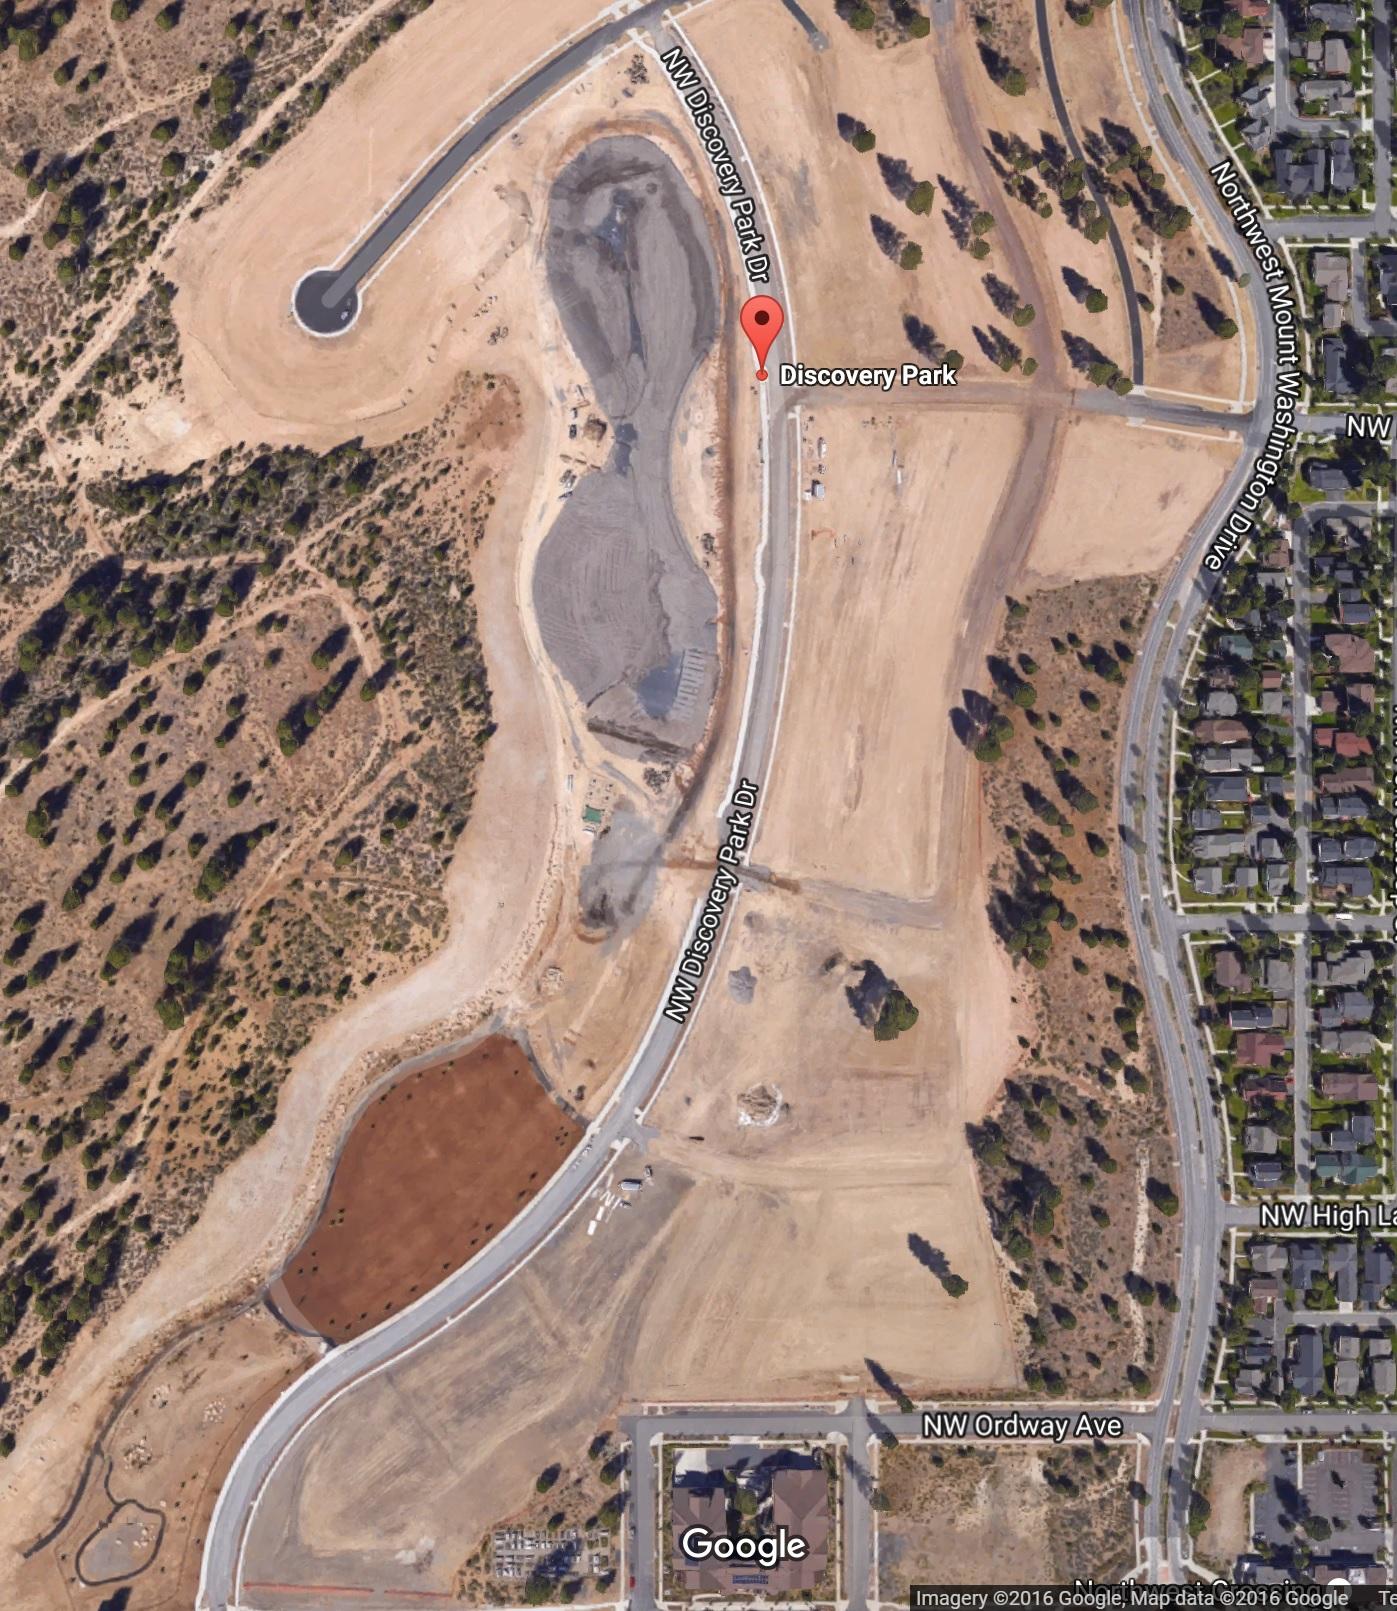 discovery-park-google-maps - JessBFit, LLC on